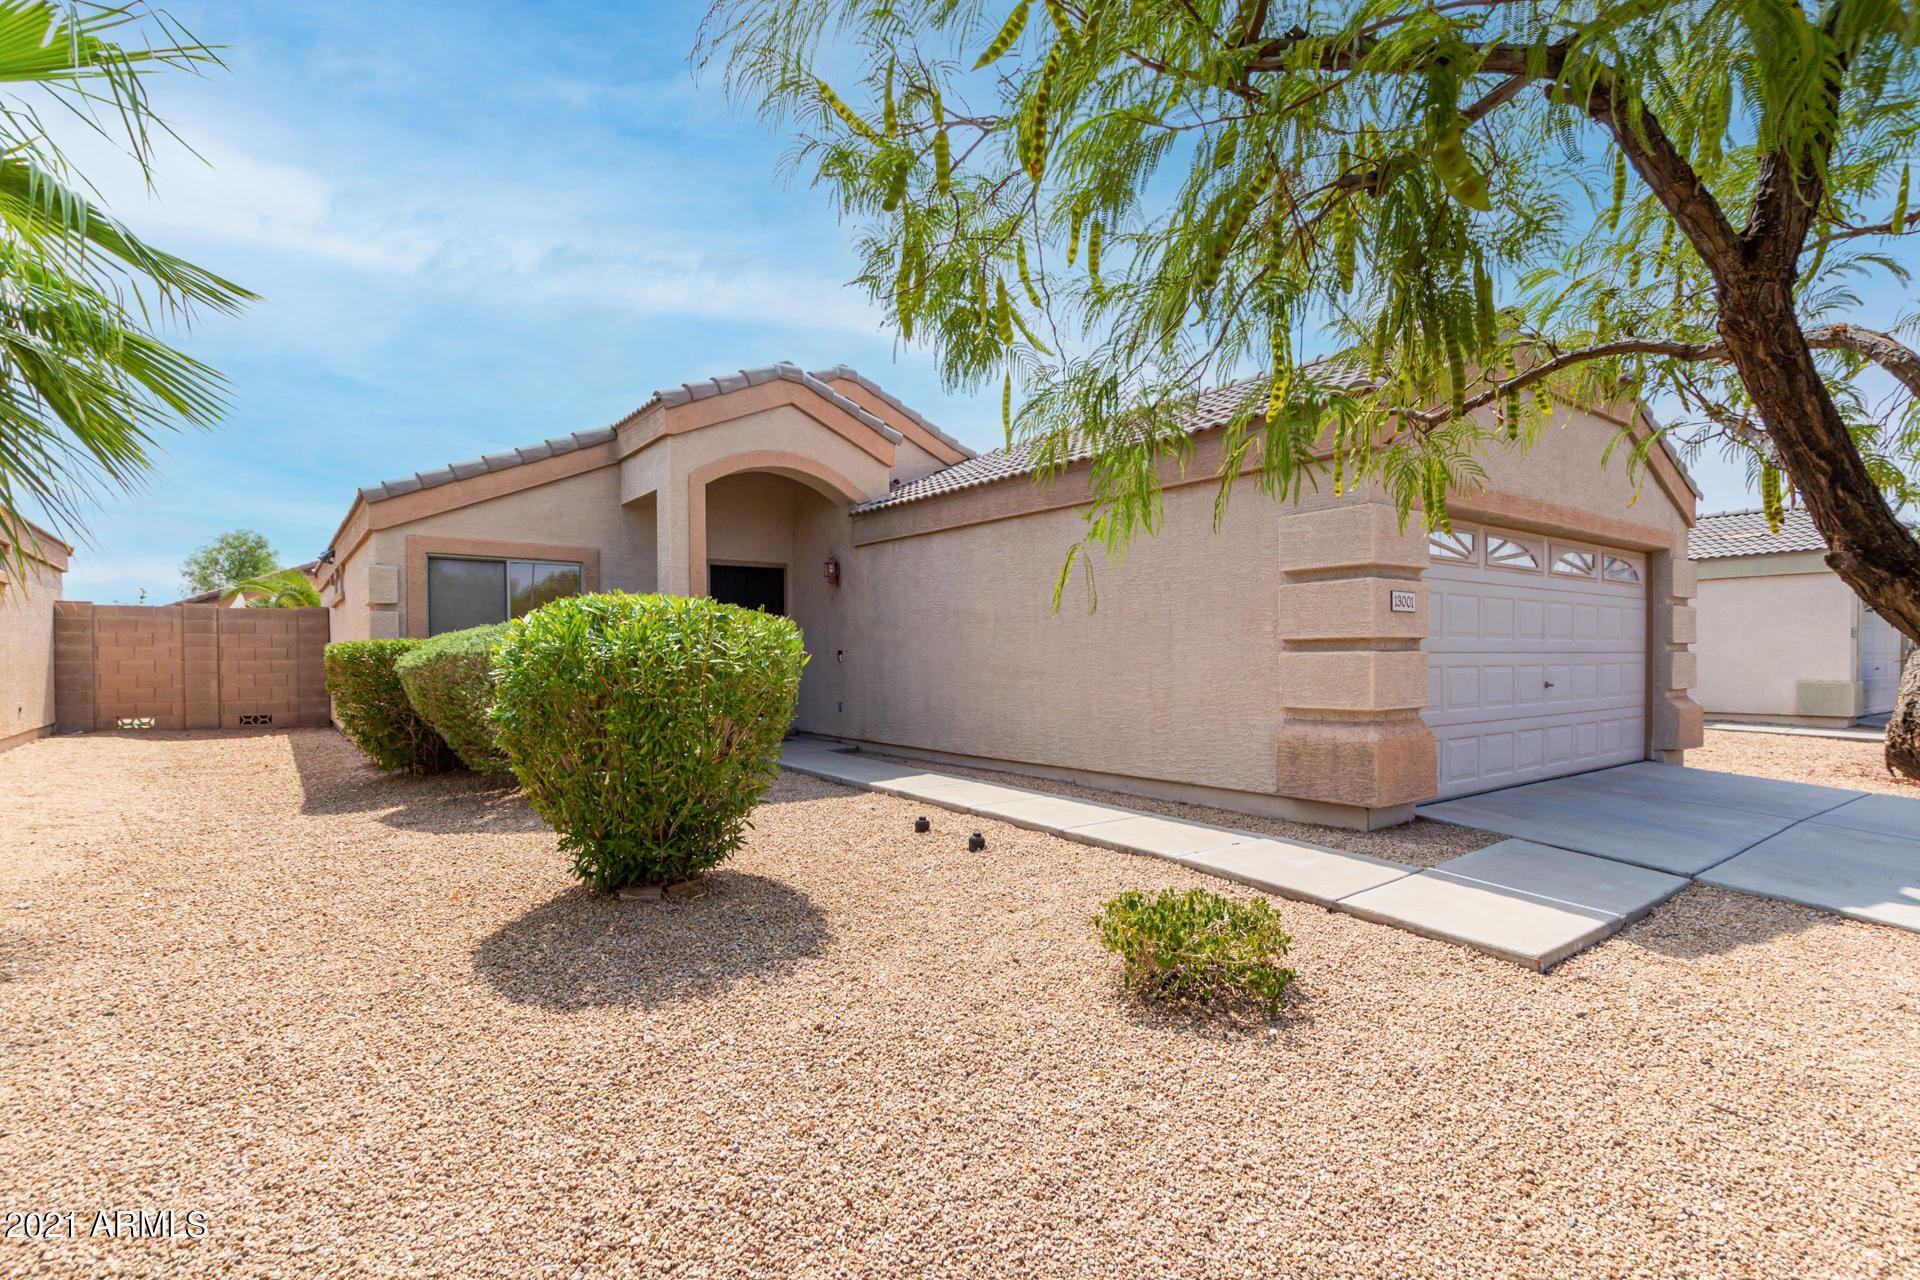 Photo of 13001 N 127TH Lane, El Mirage, AZ 85335 (MLS # 6268246)